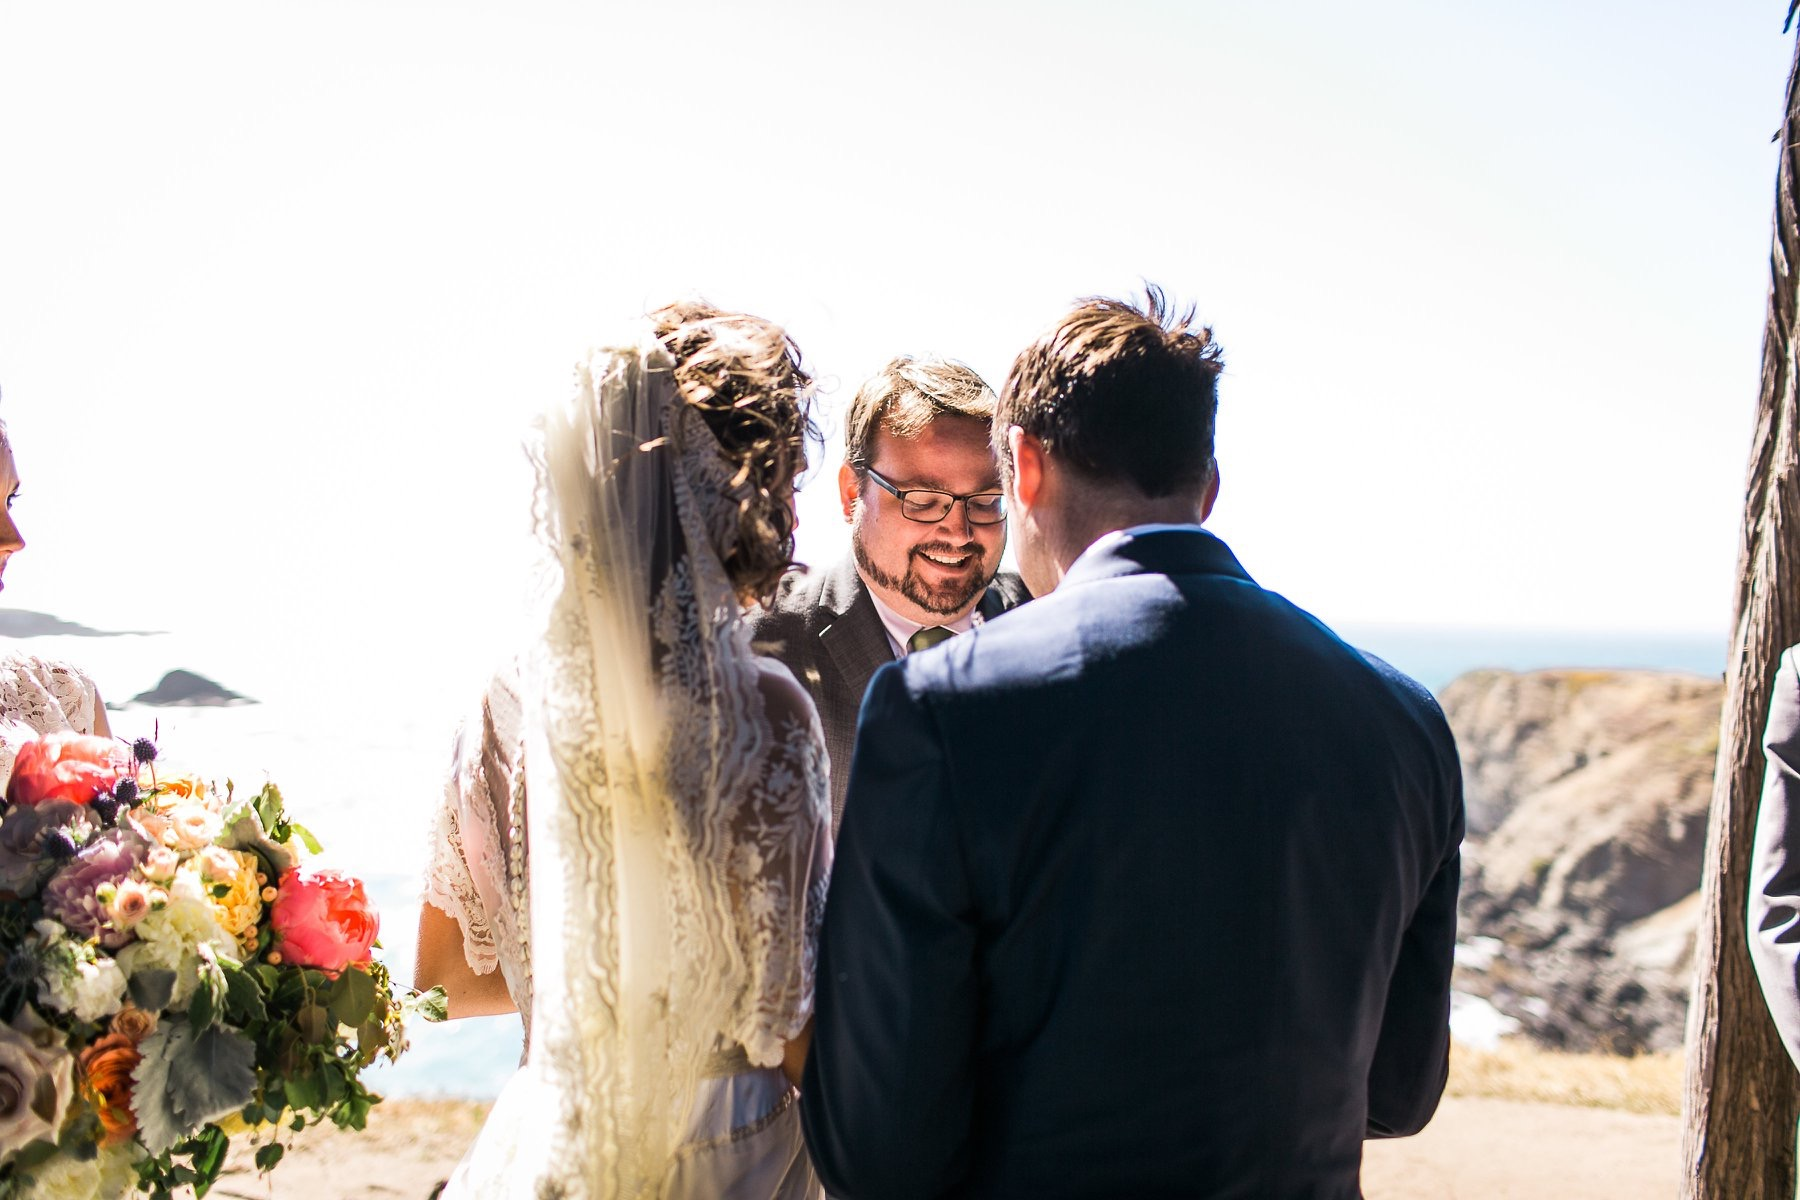 Look Like an Over-Prepared Superhero - The Five Things All Wedding Officiants Should HavePhoto by Maria Villano (@maria.villano)